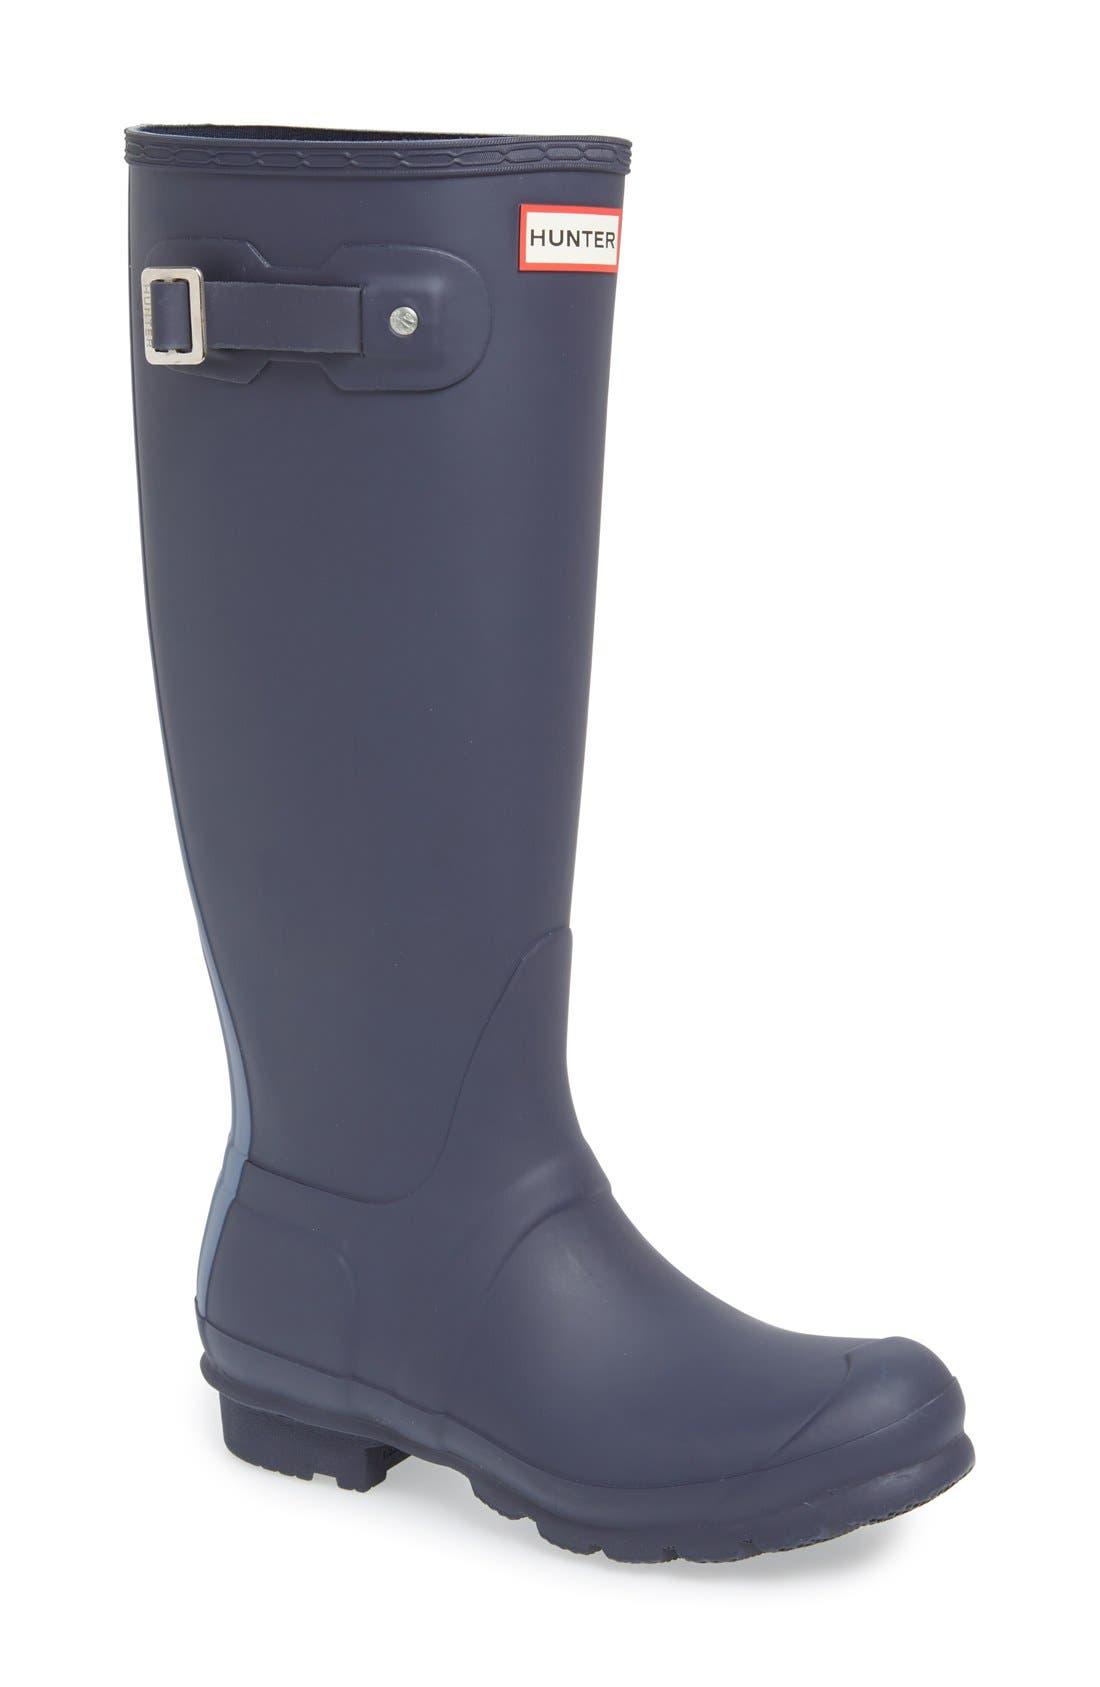 Main Image - Hunter 'Original Stripe' Waterproof Rubber Boot (Women)